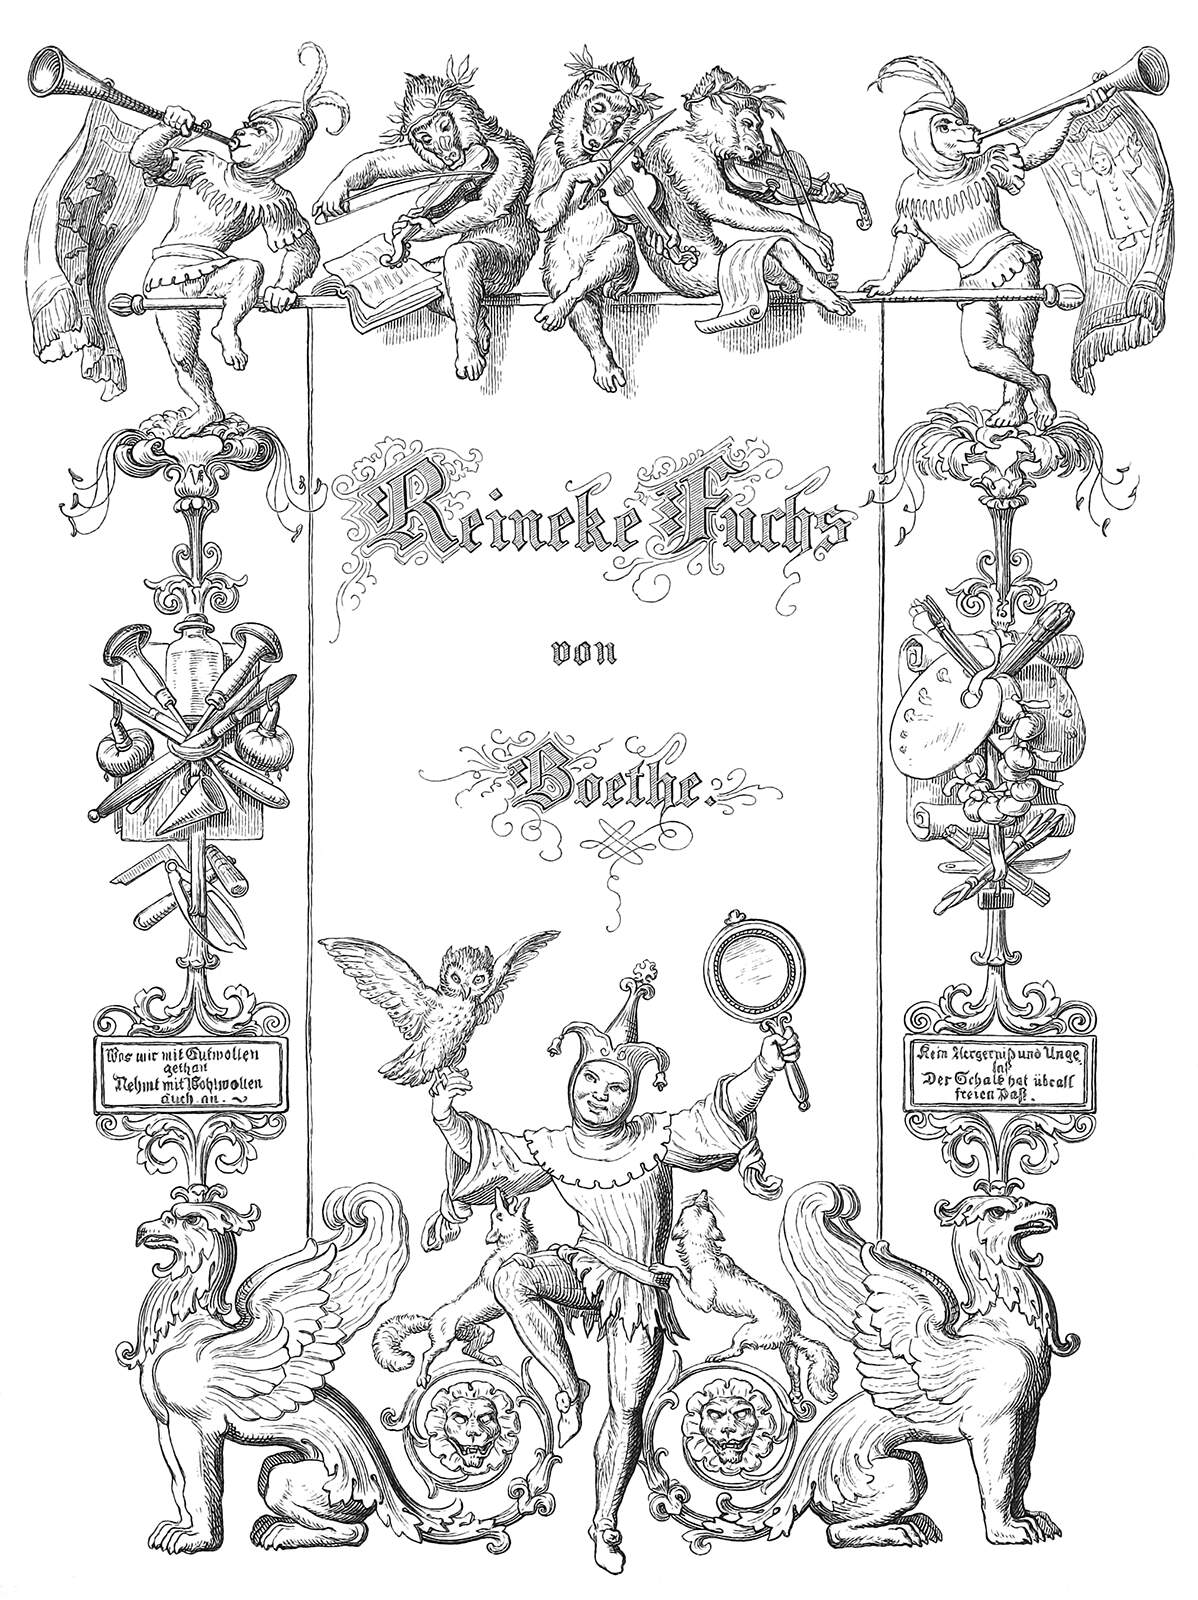 reineke-fuchs-title-1600.jpg (1198×1600)